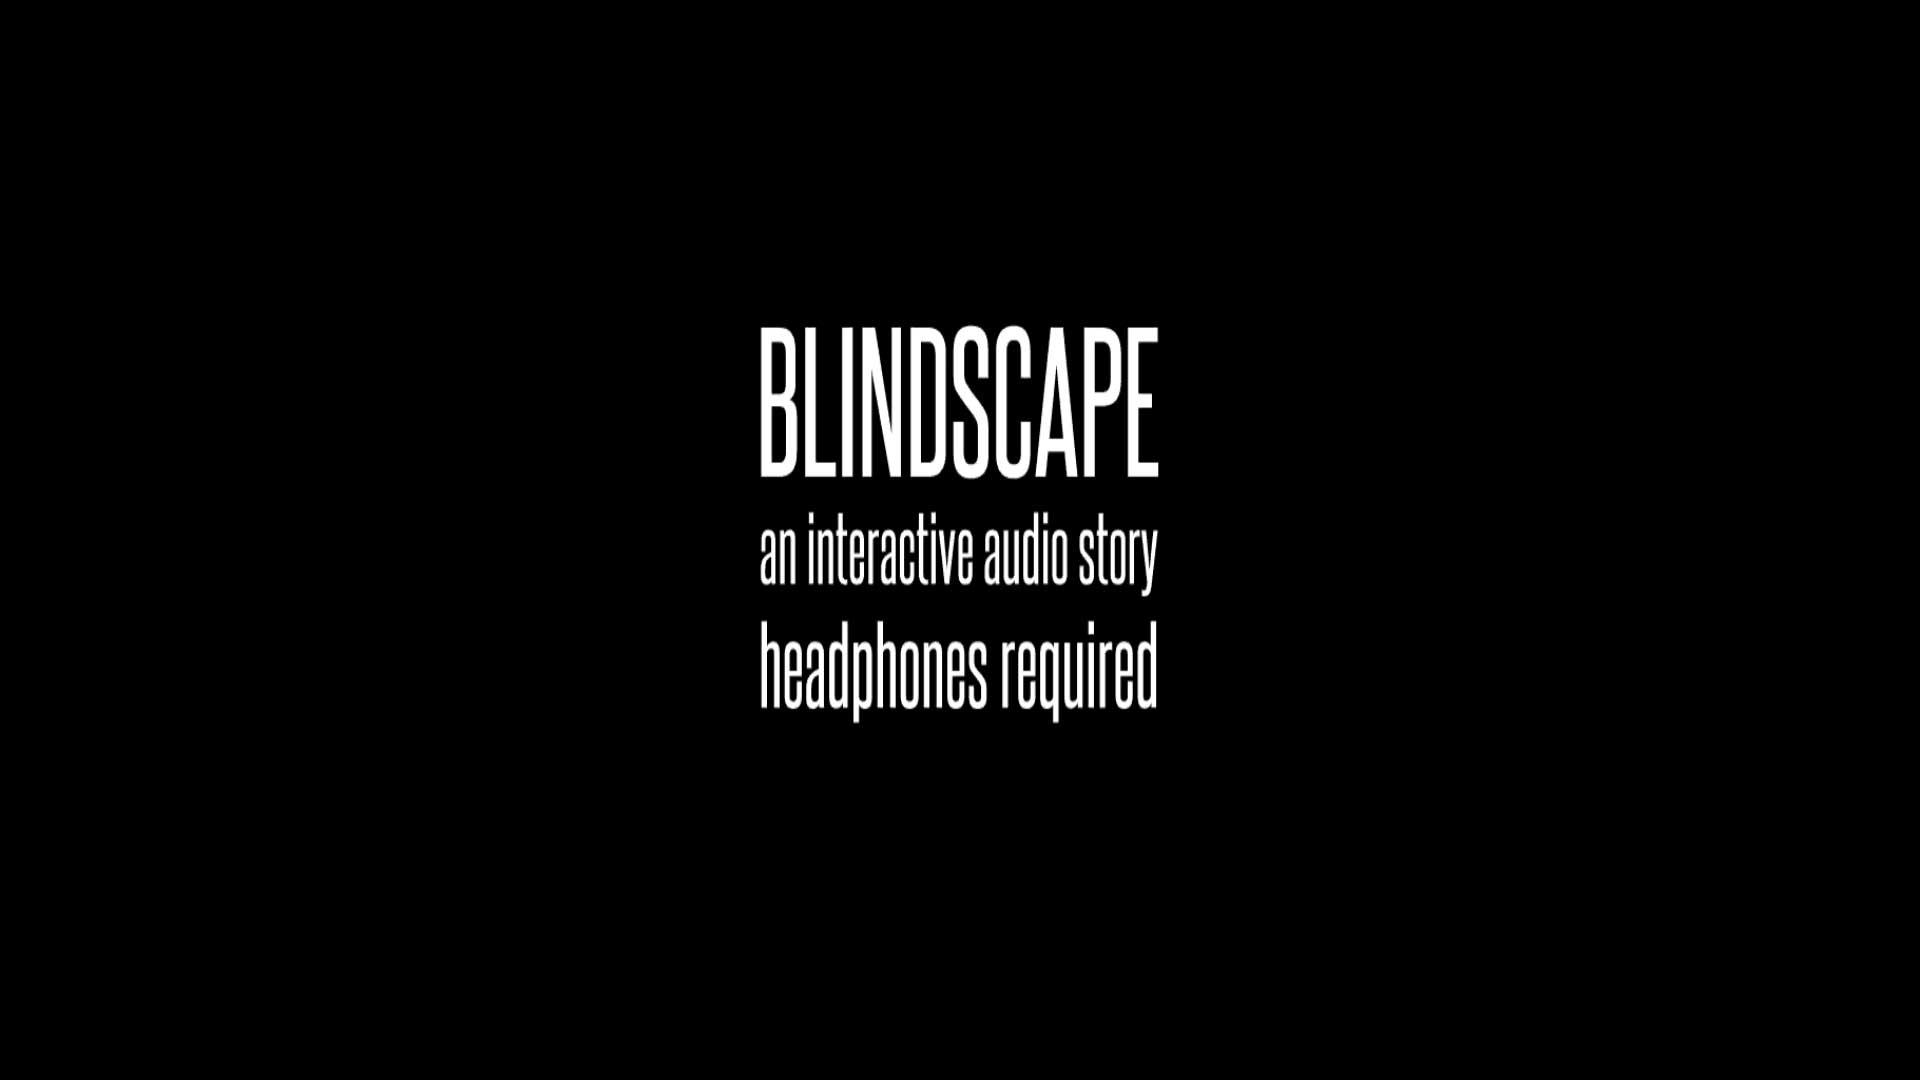 blindscape title screen